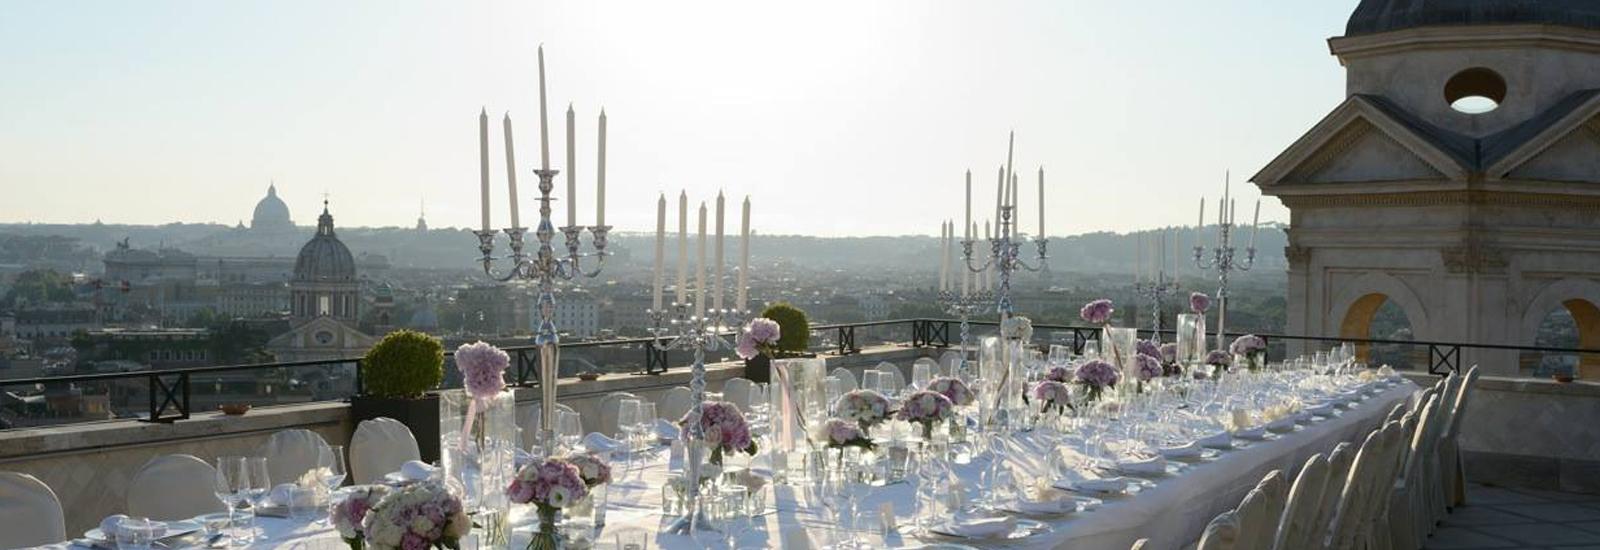 Spanish Steps Rome wedding venue